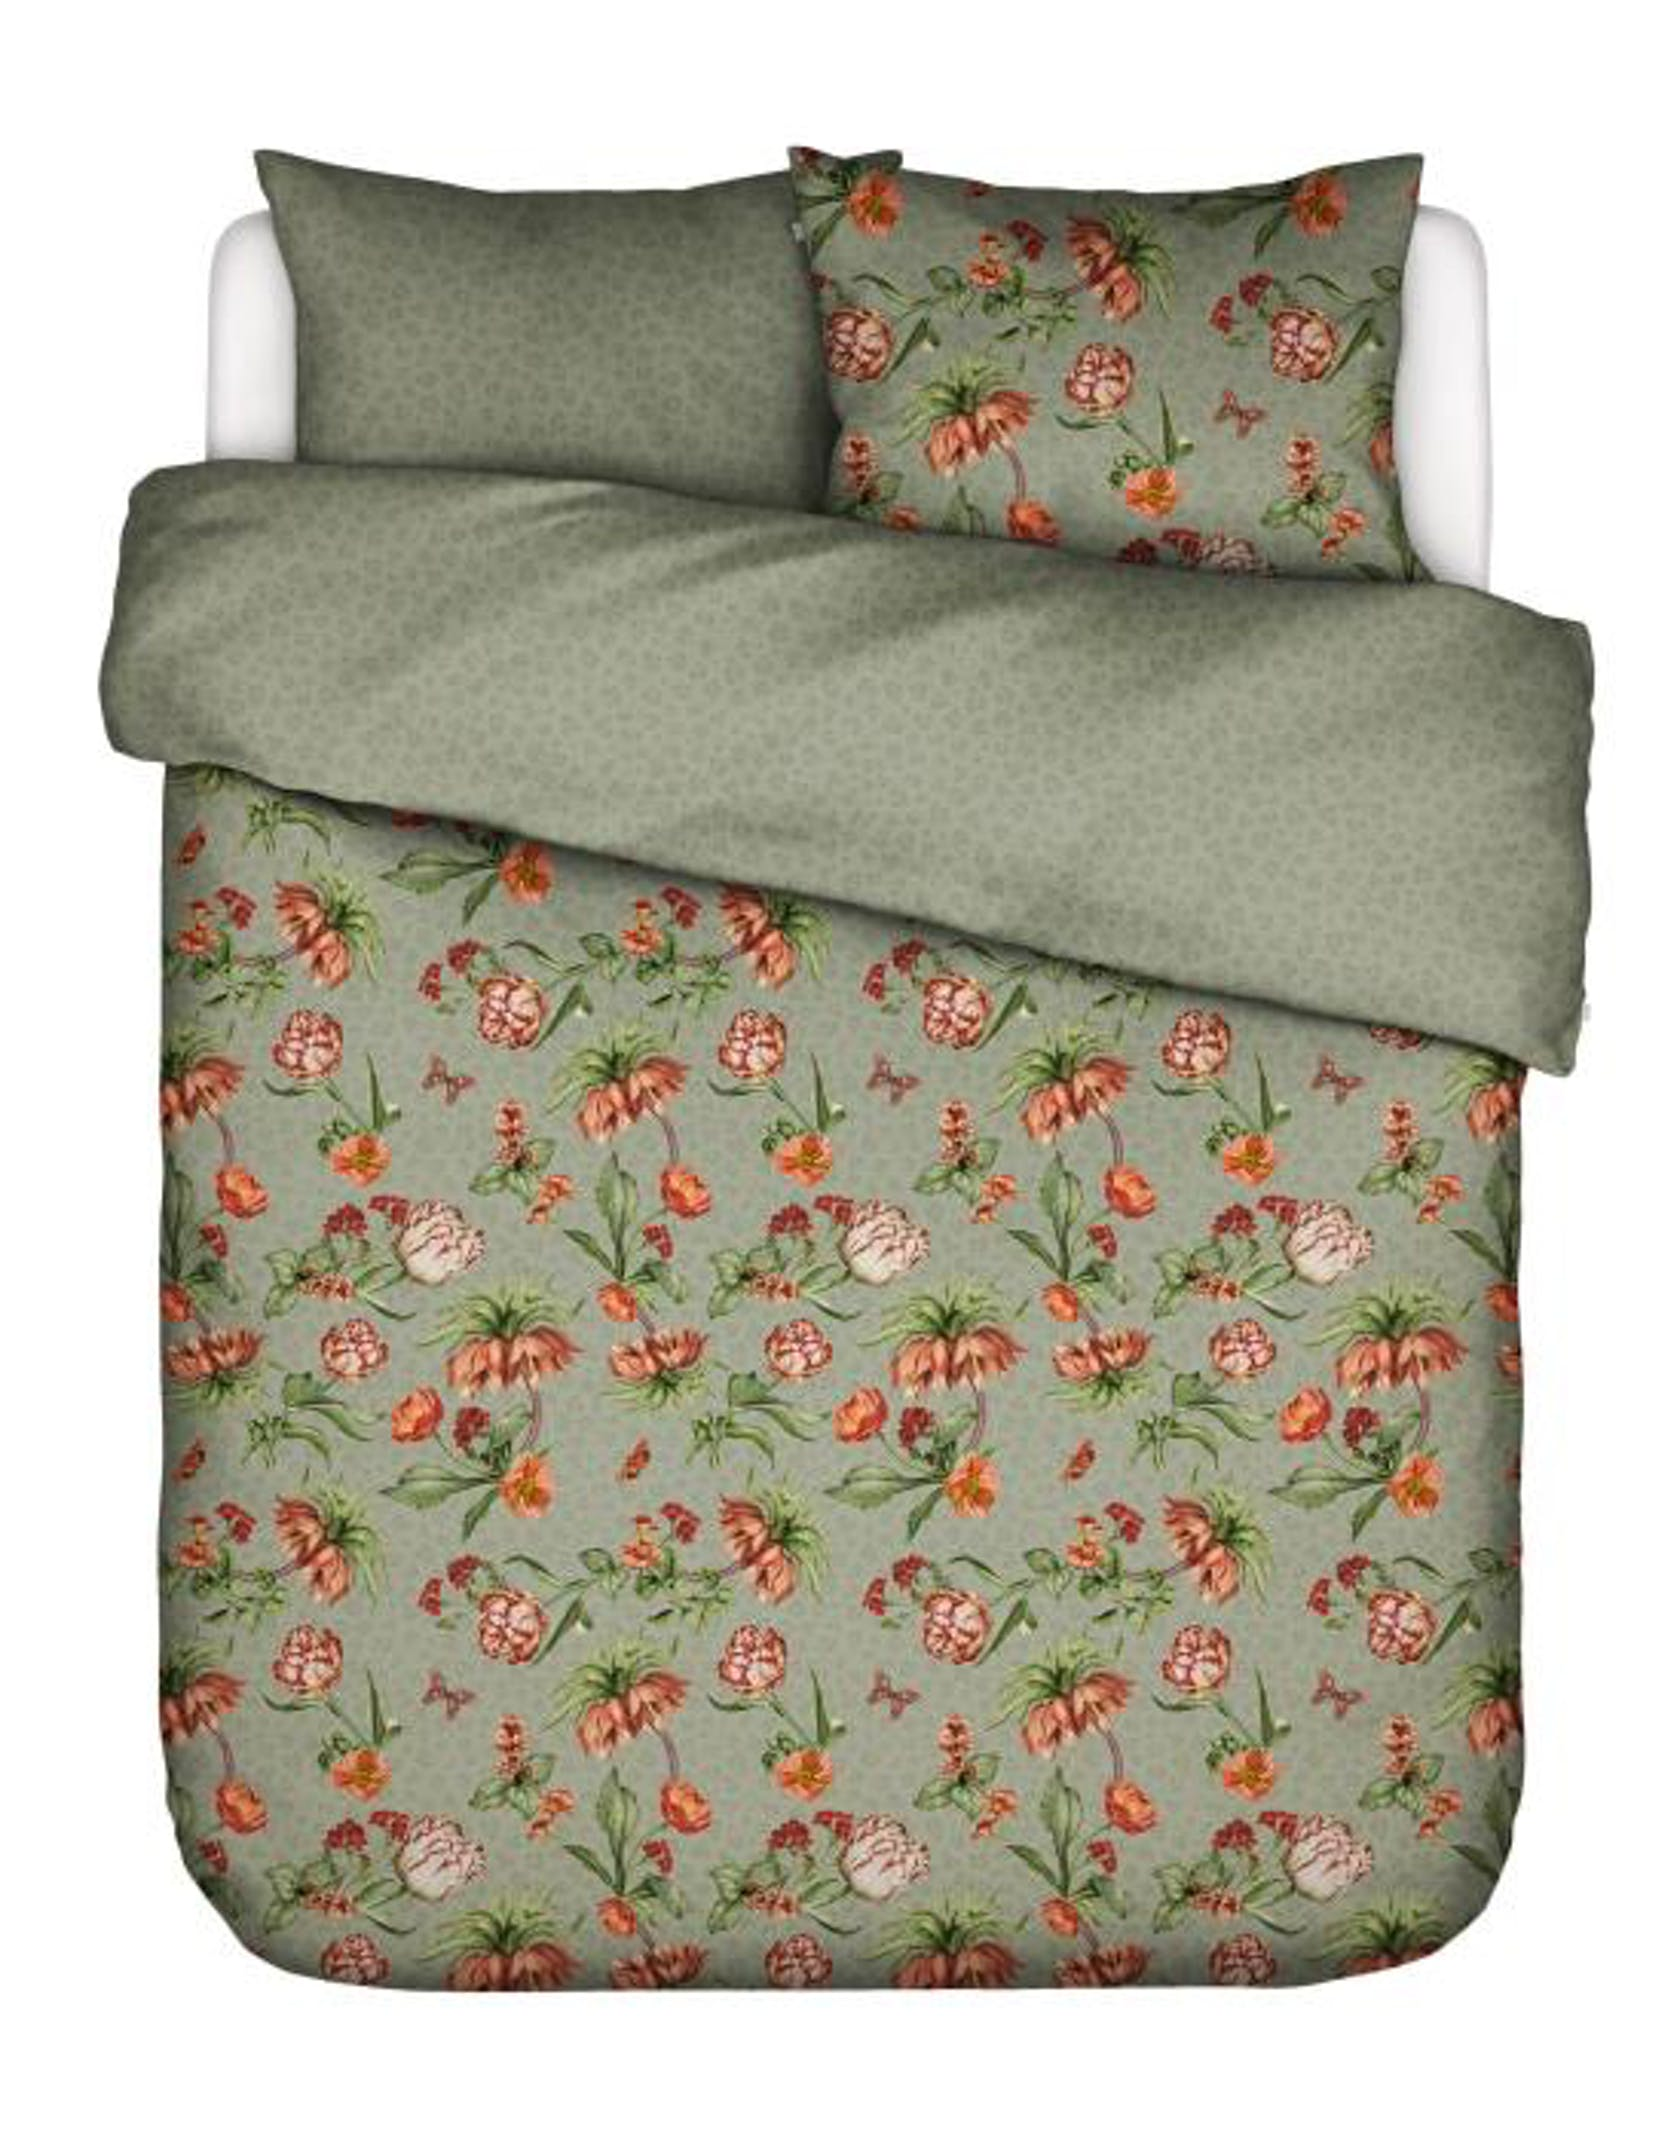 Essenza Femm Rosemary green Duvet cover 260 x 240